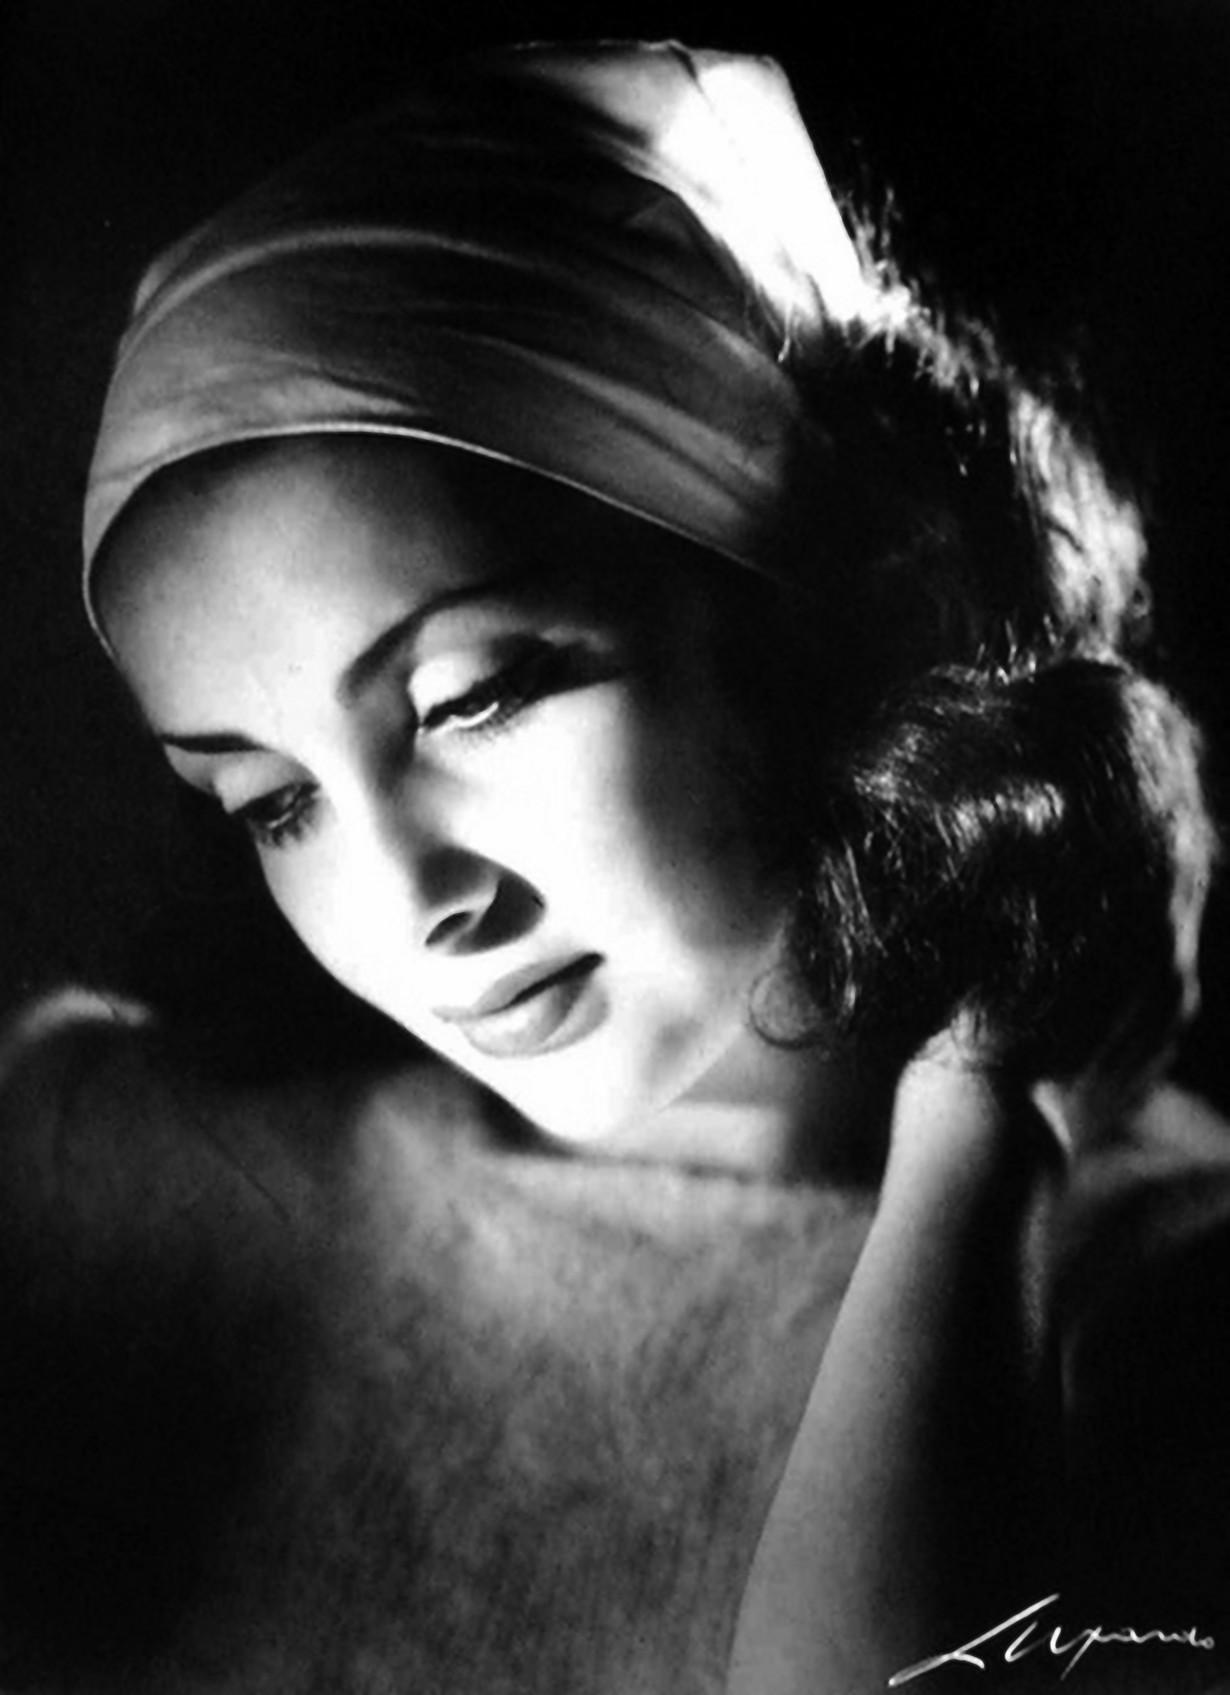 Elio Luxardo - Portrait of the photographer Ghitta Carell, 1955